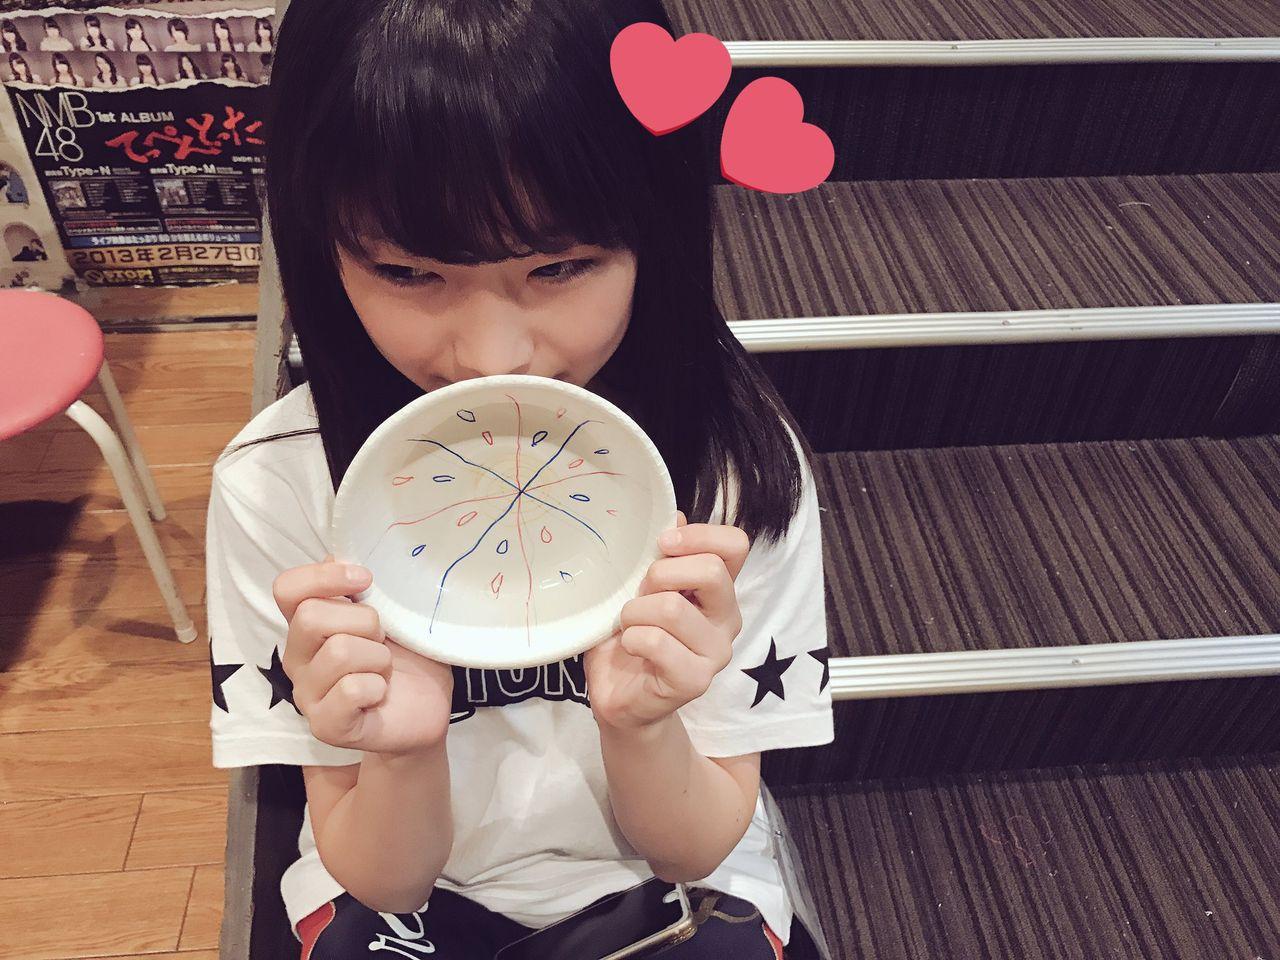 【NMB48西仲七海】なーみ100%キタ━━━━(゚∀゚)━━━━!!